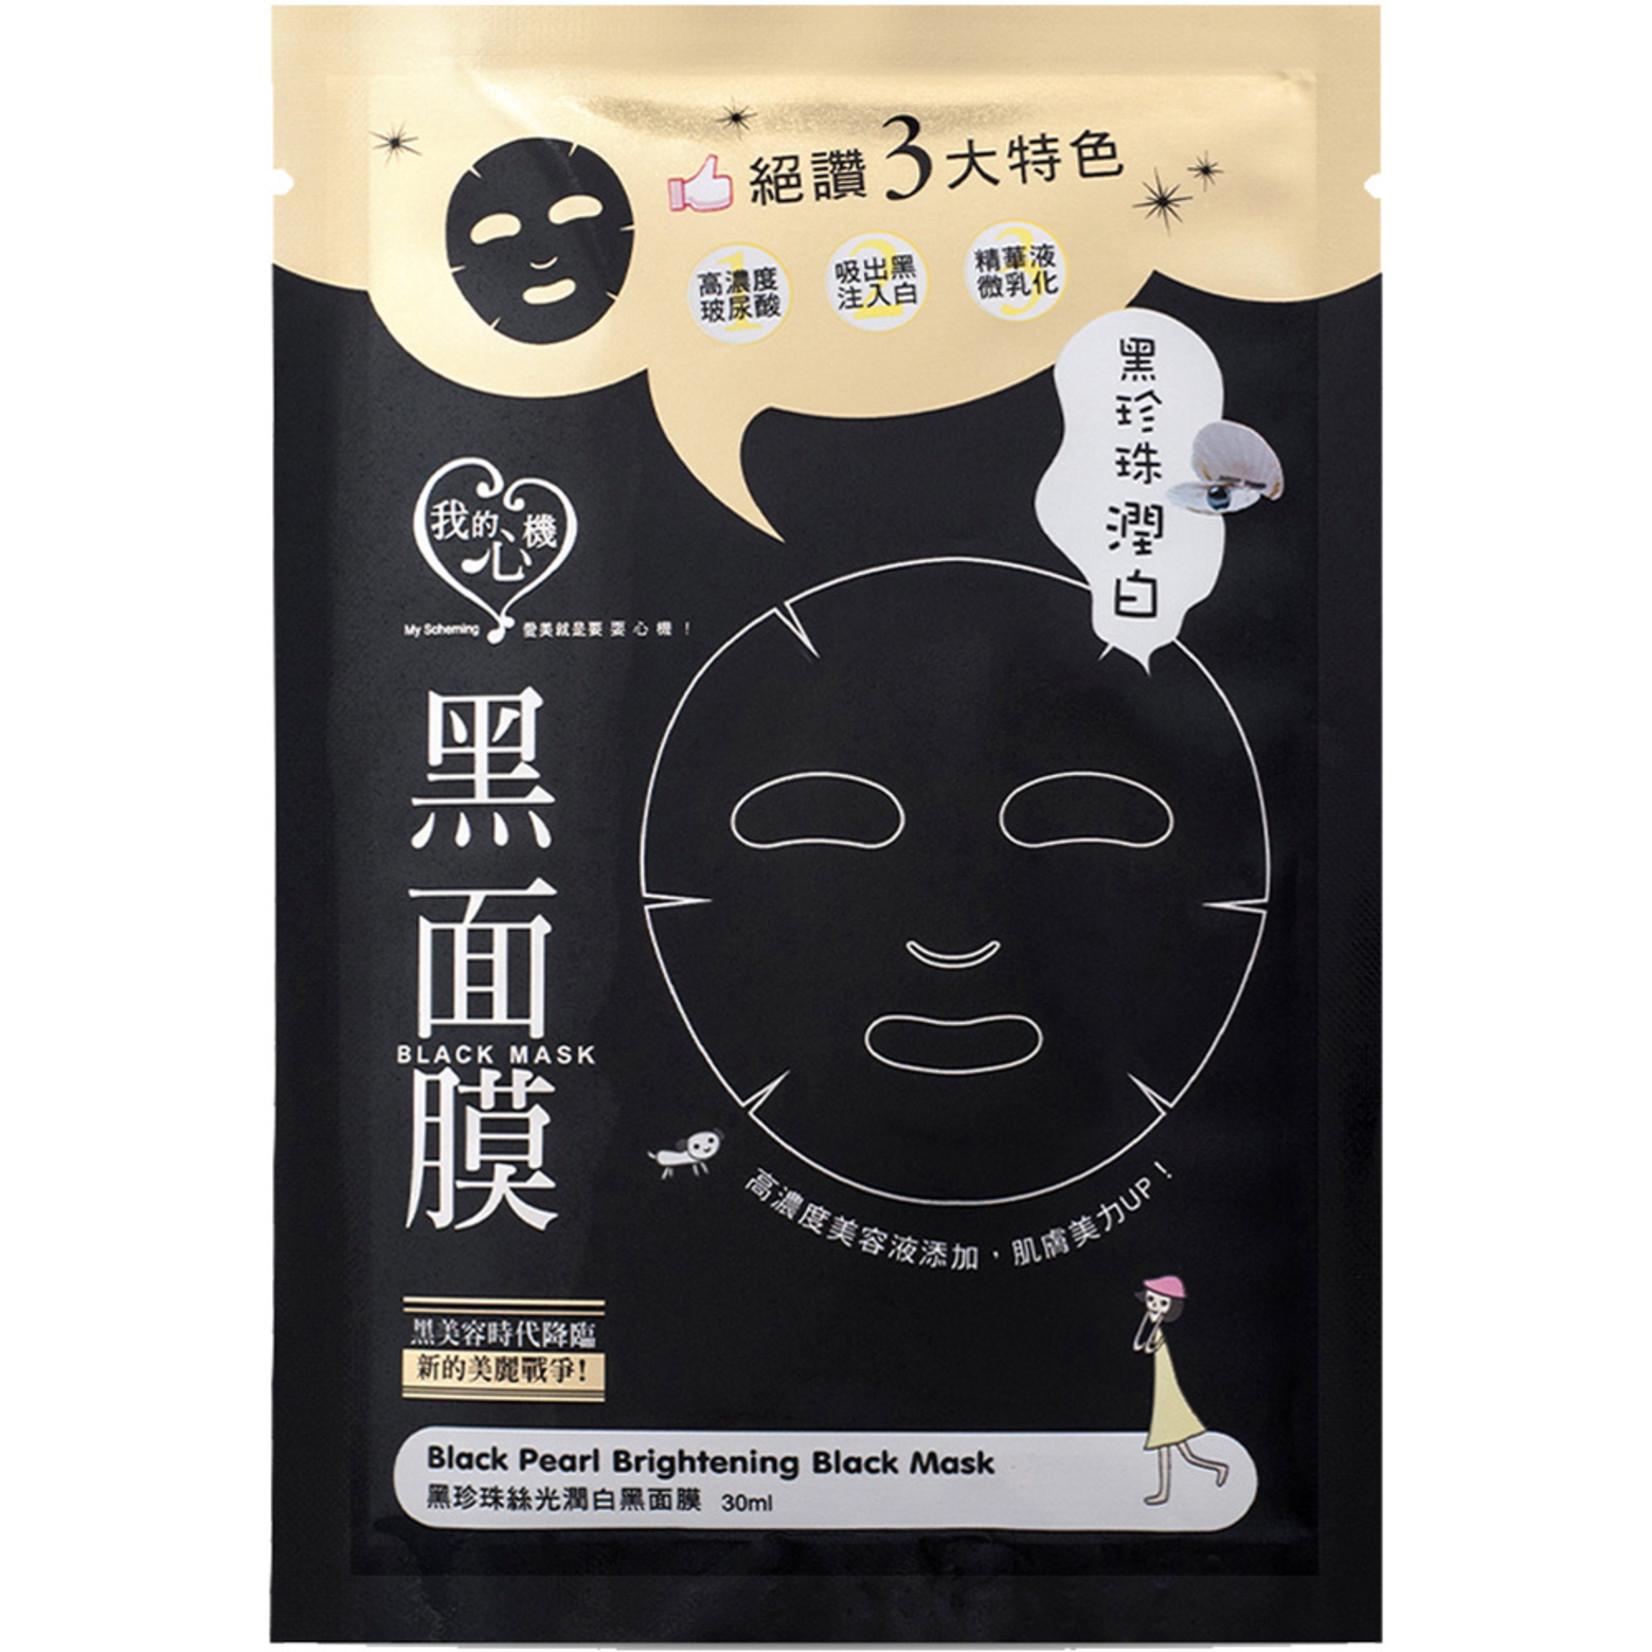 My Scheming Black Pearl Brightening Black Mask